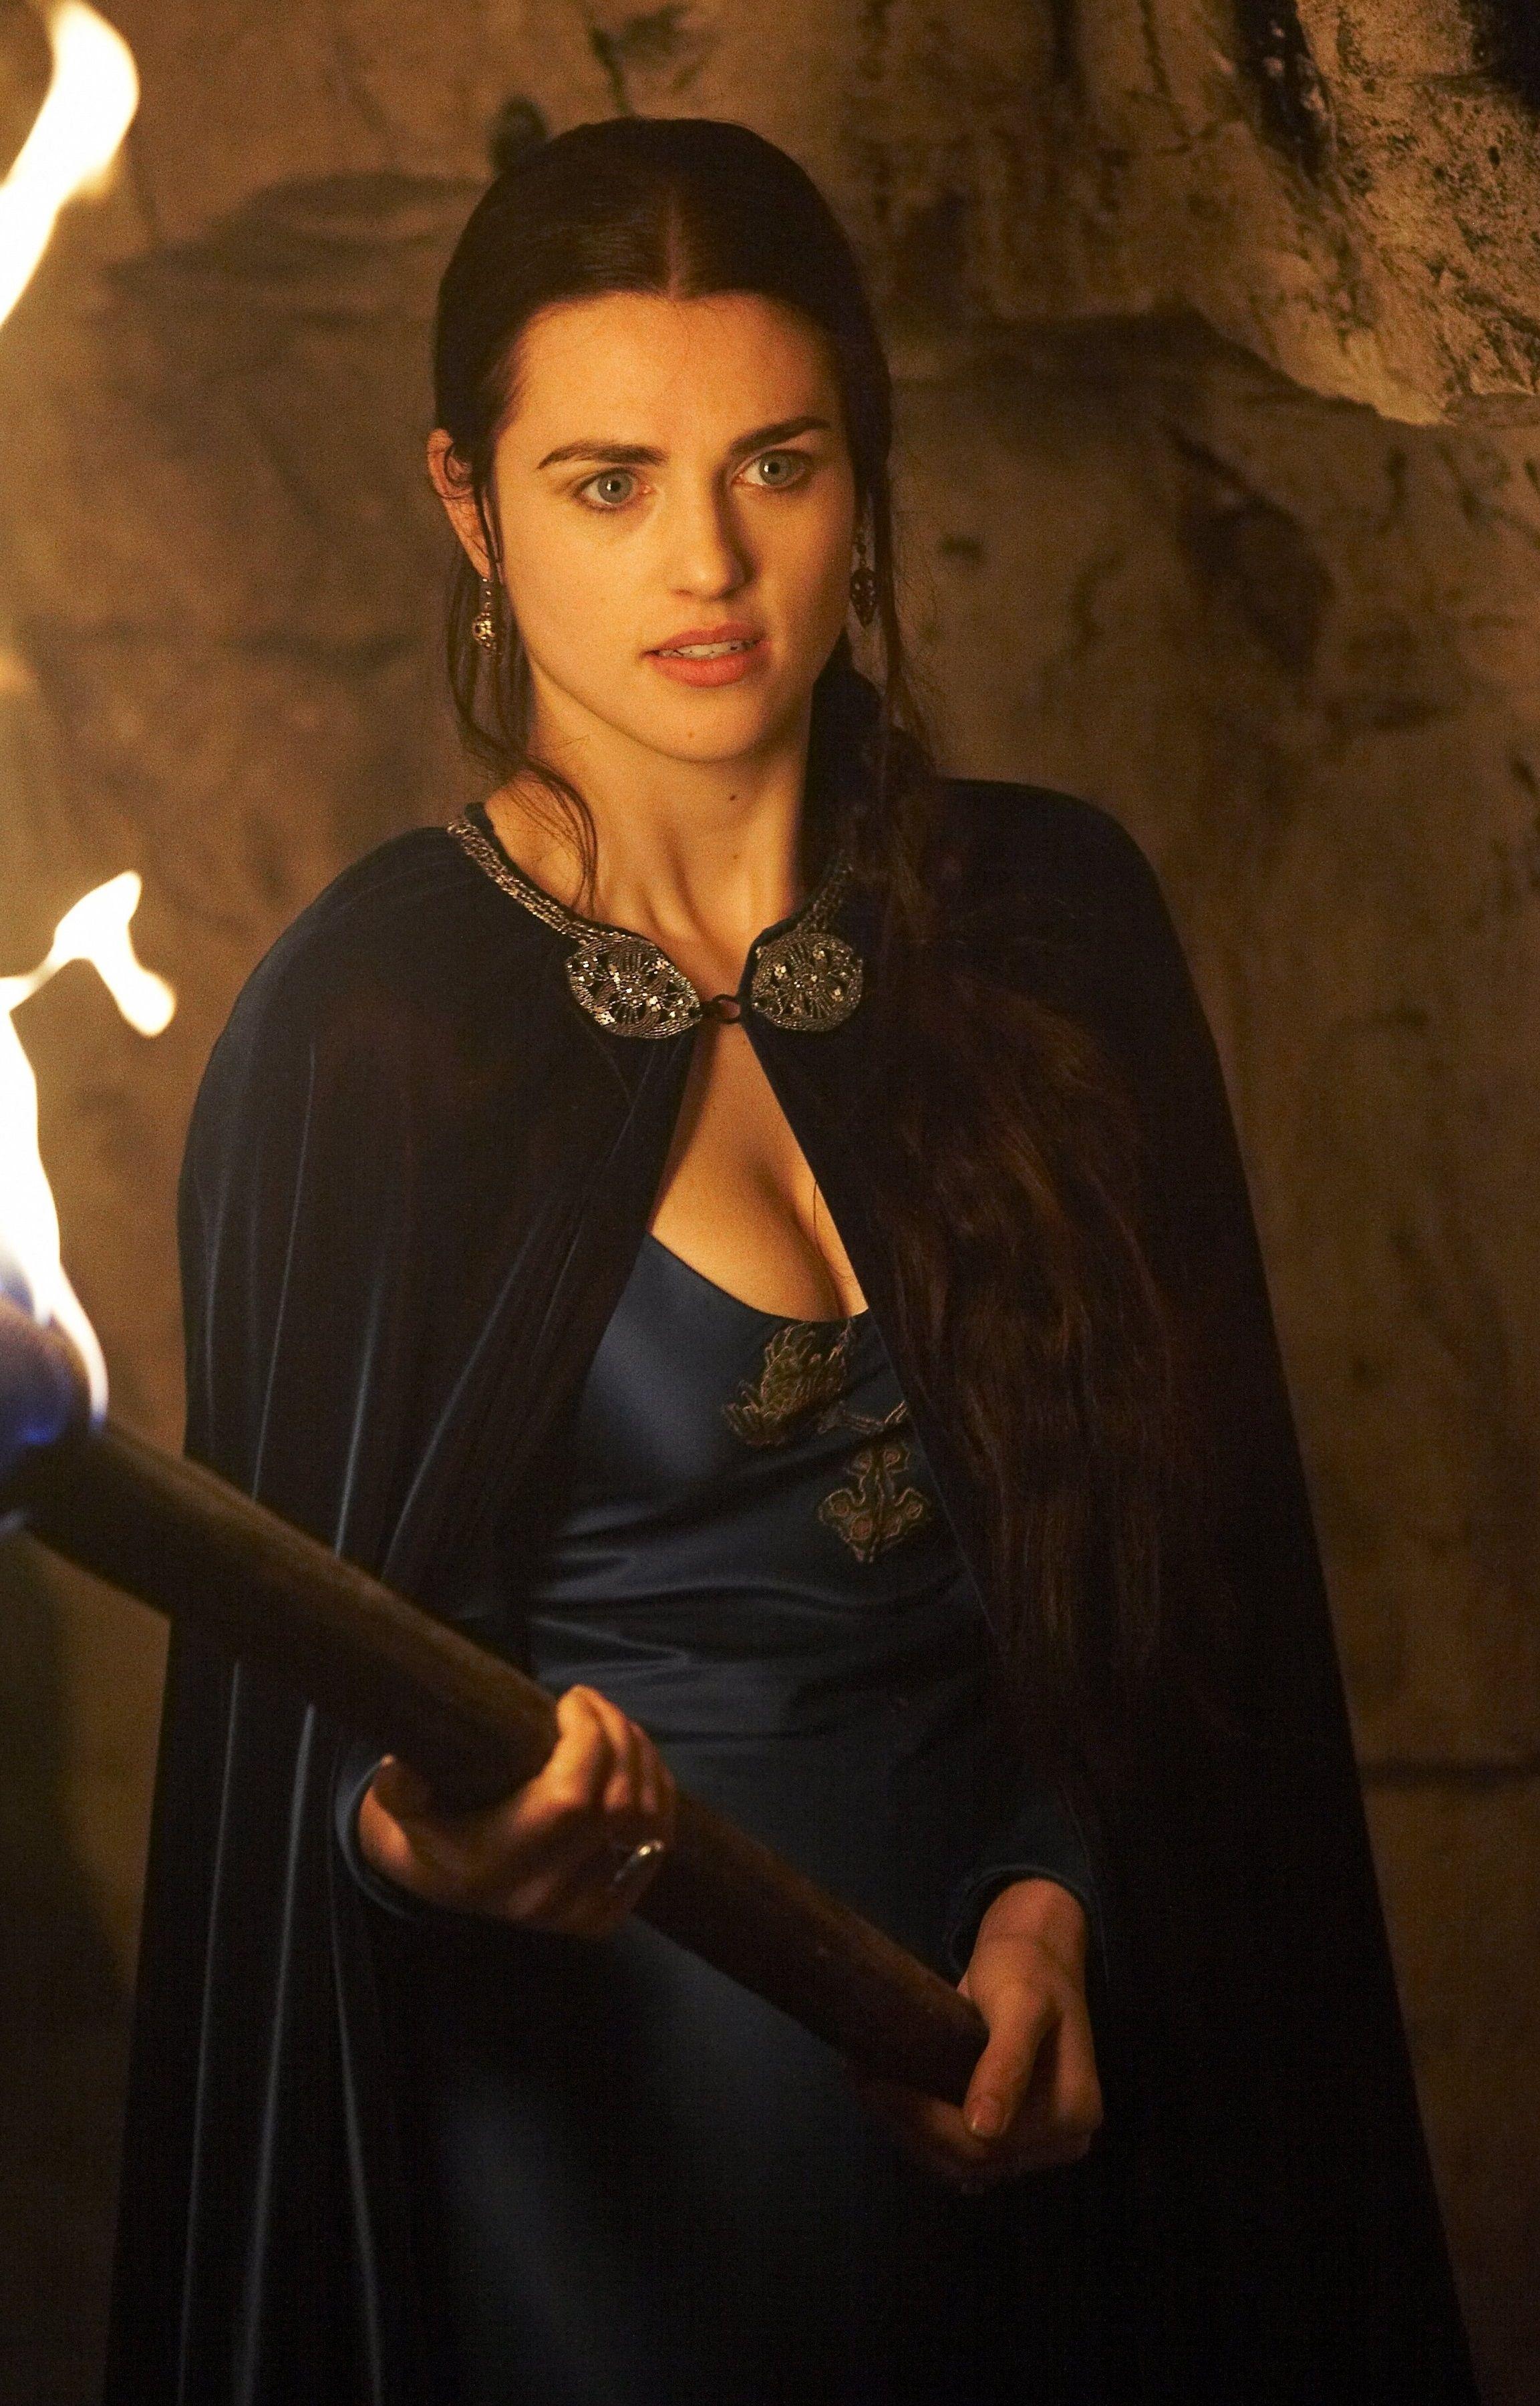 Merlin season 1 episode 7 2008 - Morgana Black Fur Outfit Merlin Woven Magic Pinterest Photos Fur And Outfits